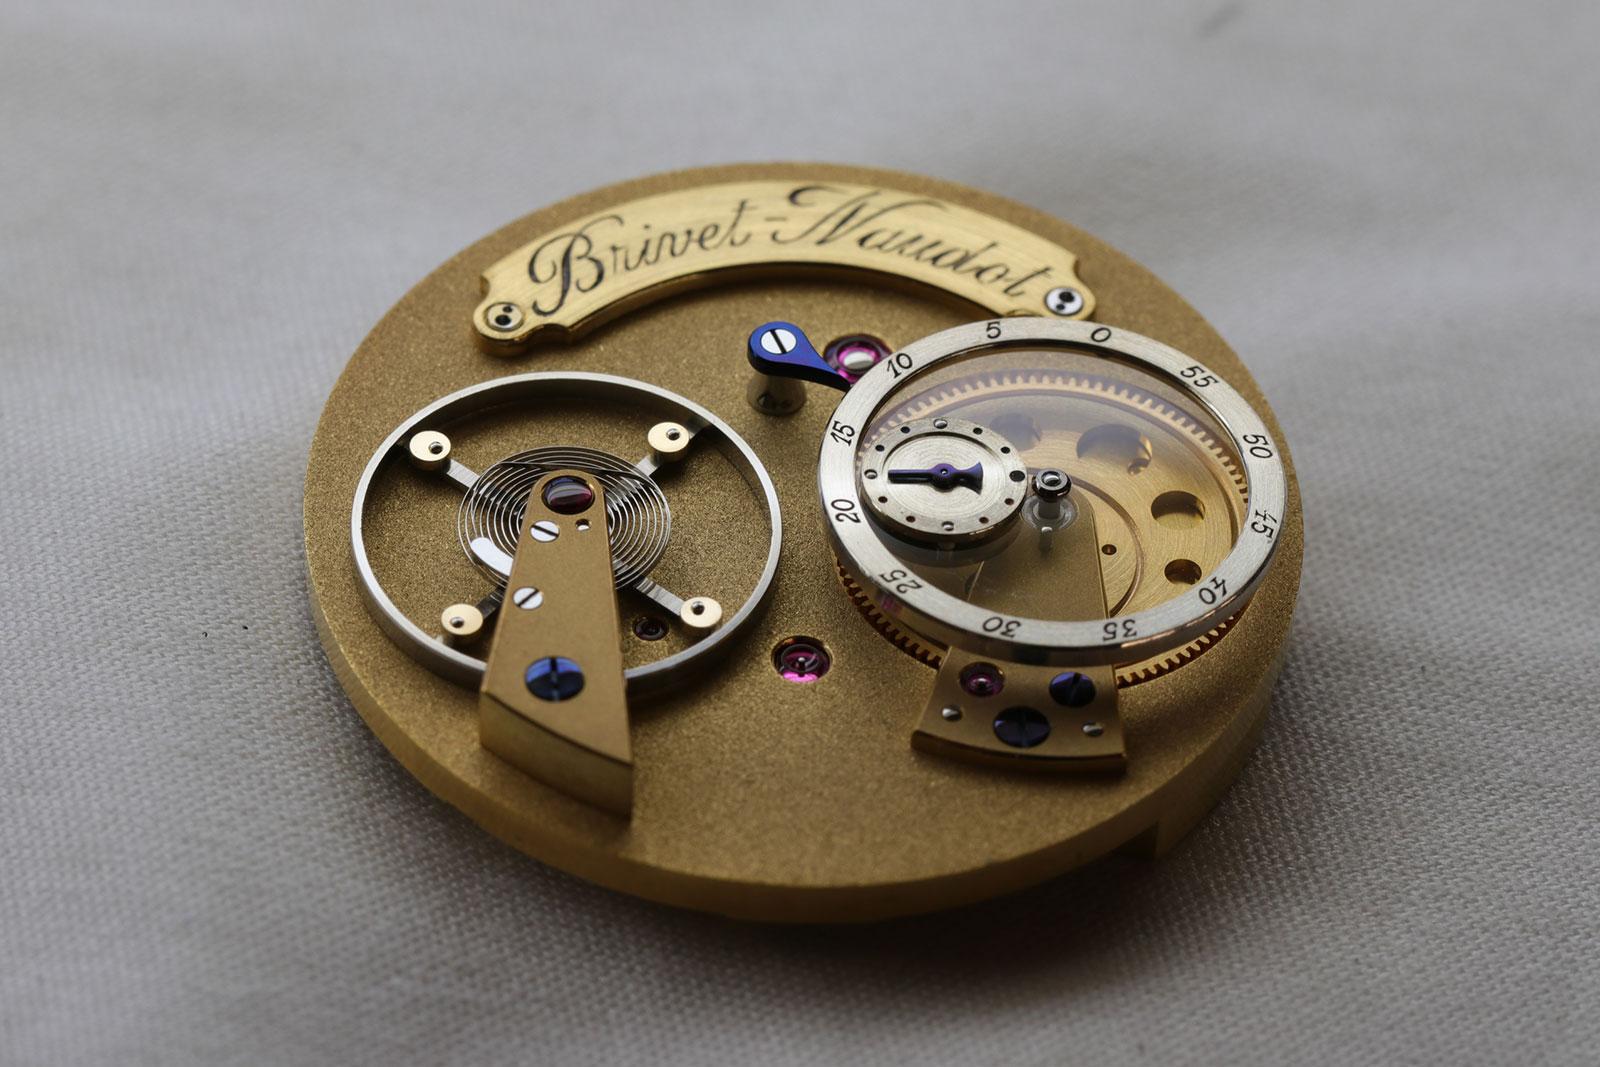 Brivet-Naudot wristwatch 8